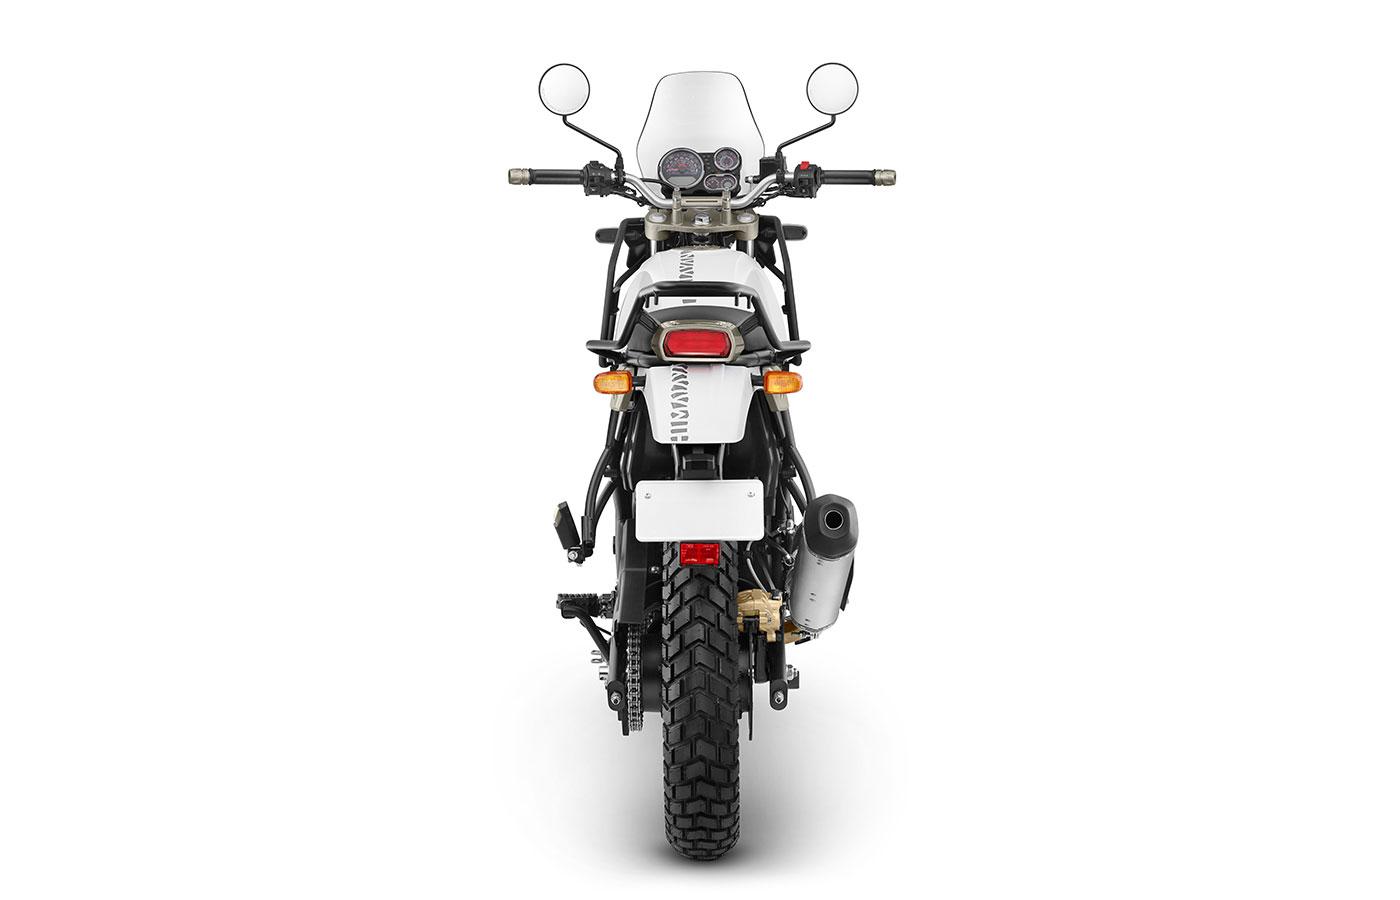 royalenfield-himalayan-bike-3